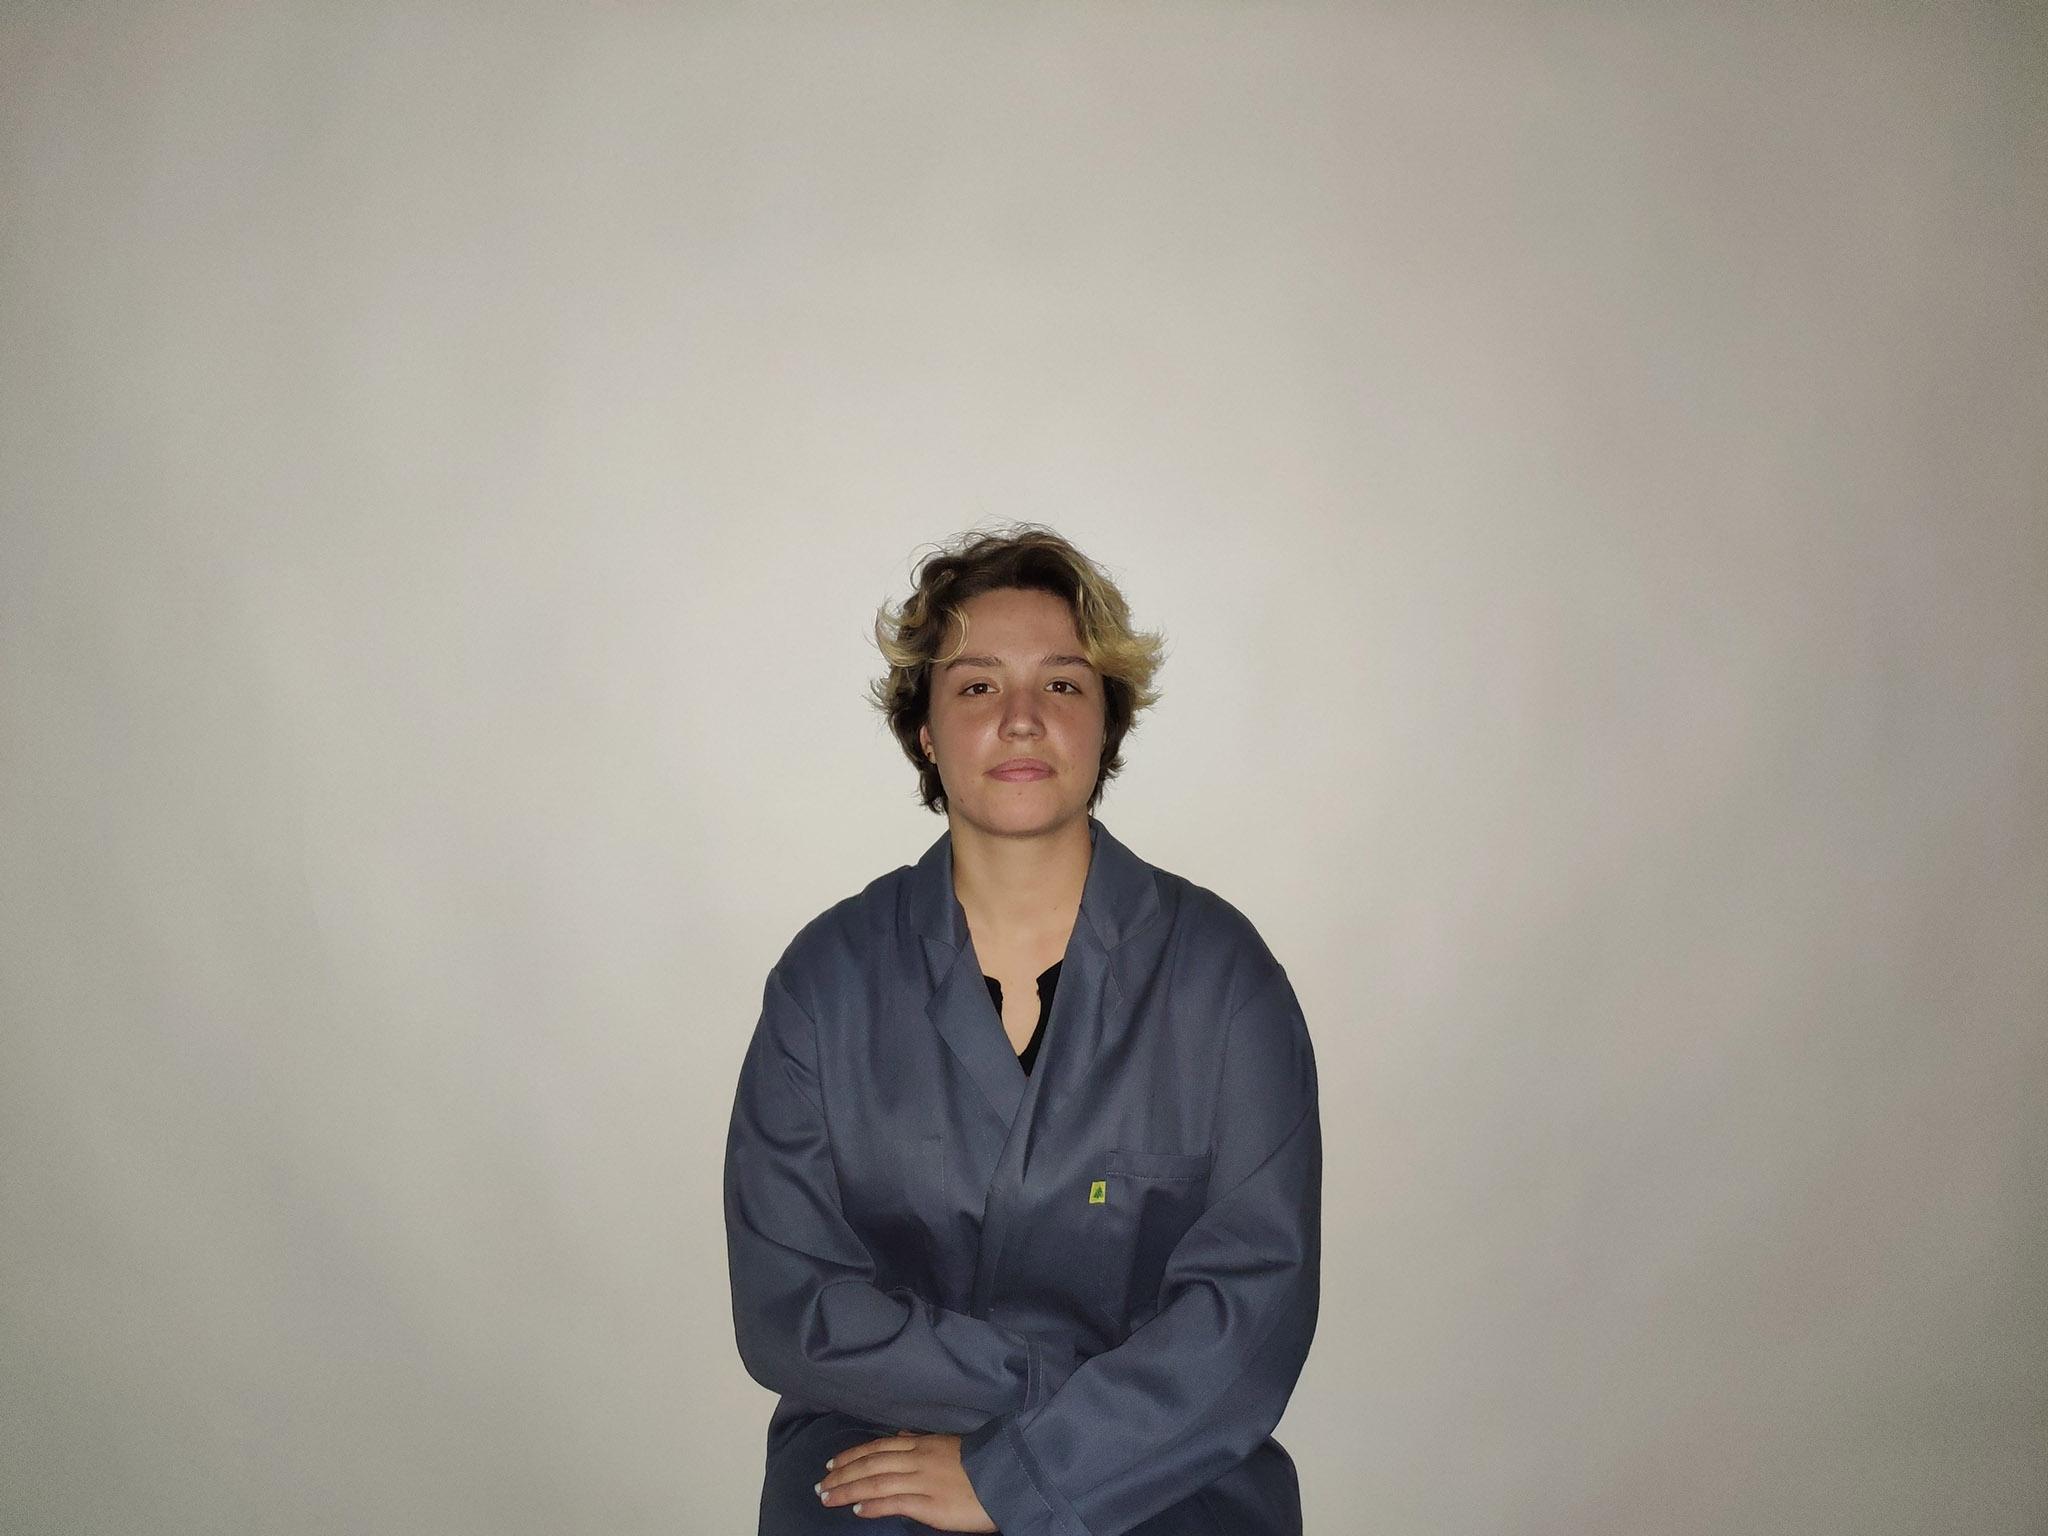 Portraits_5Lux_FLASH_SME_A_XiaomiMI8_DxOMark-e1527688575236.jpg